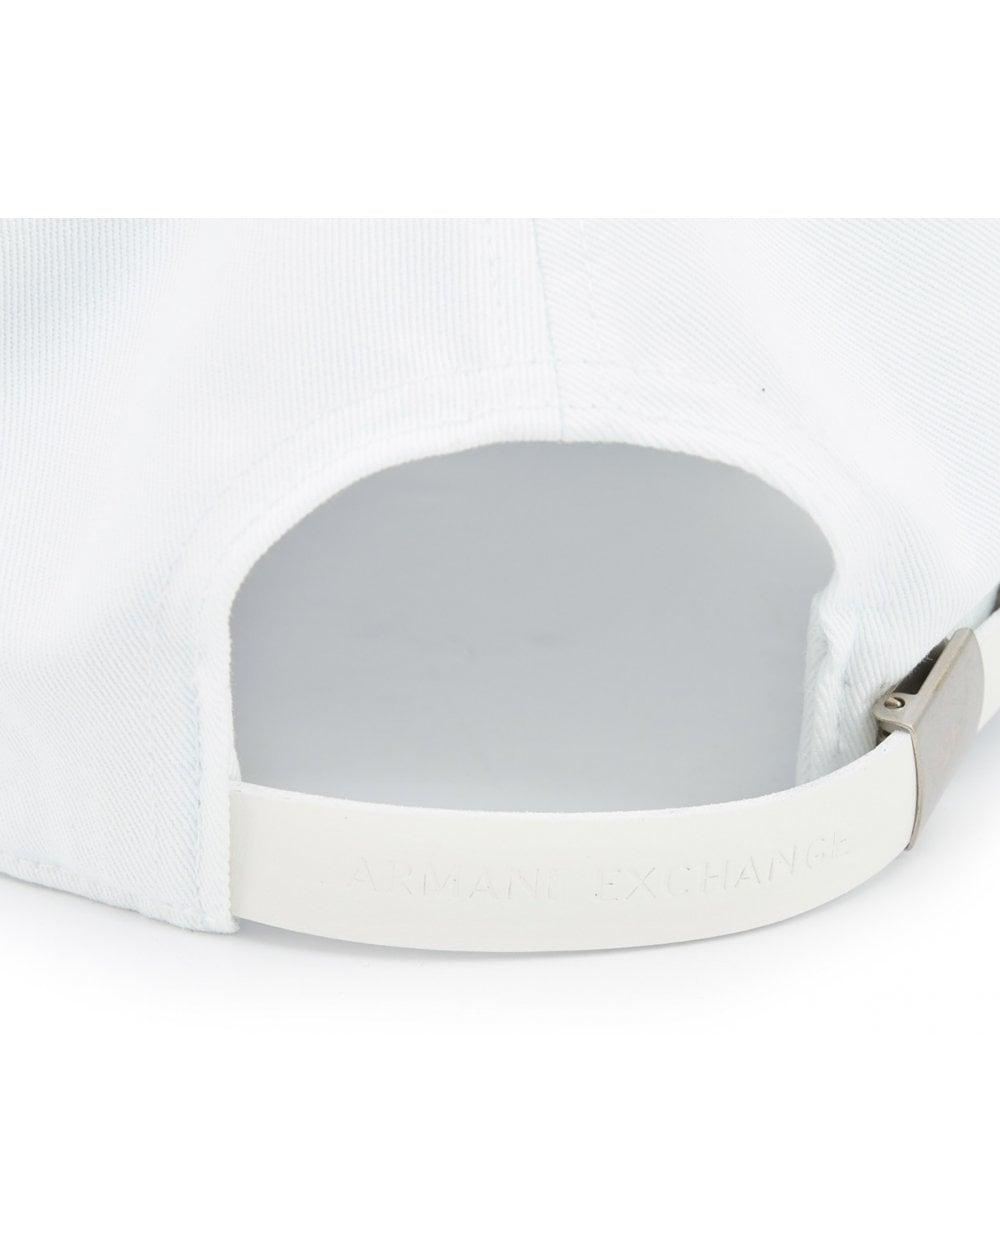 5628b54e974 Lyst - Armani Exchange Logo Cap in White for Men